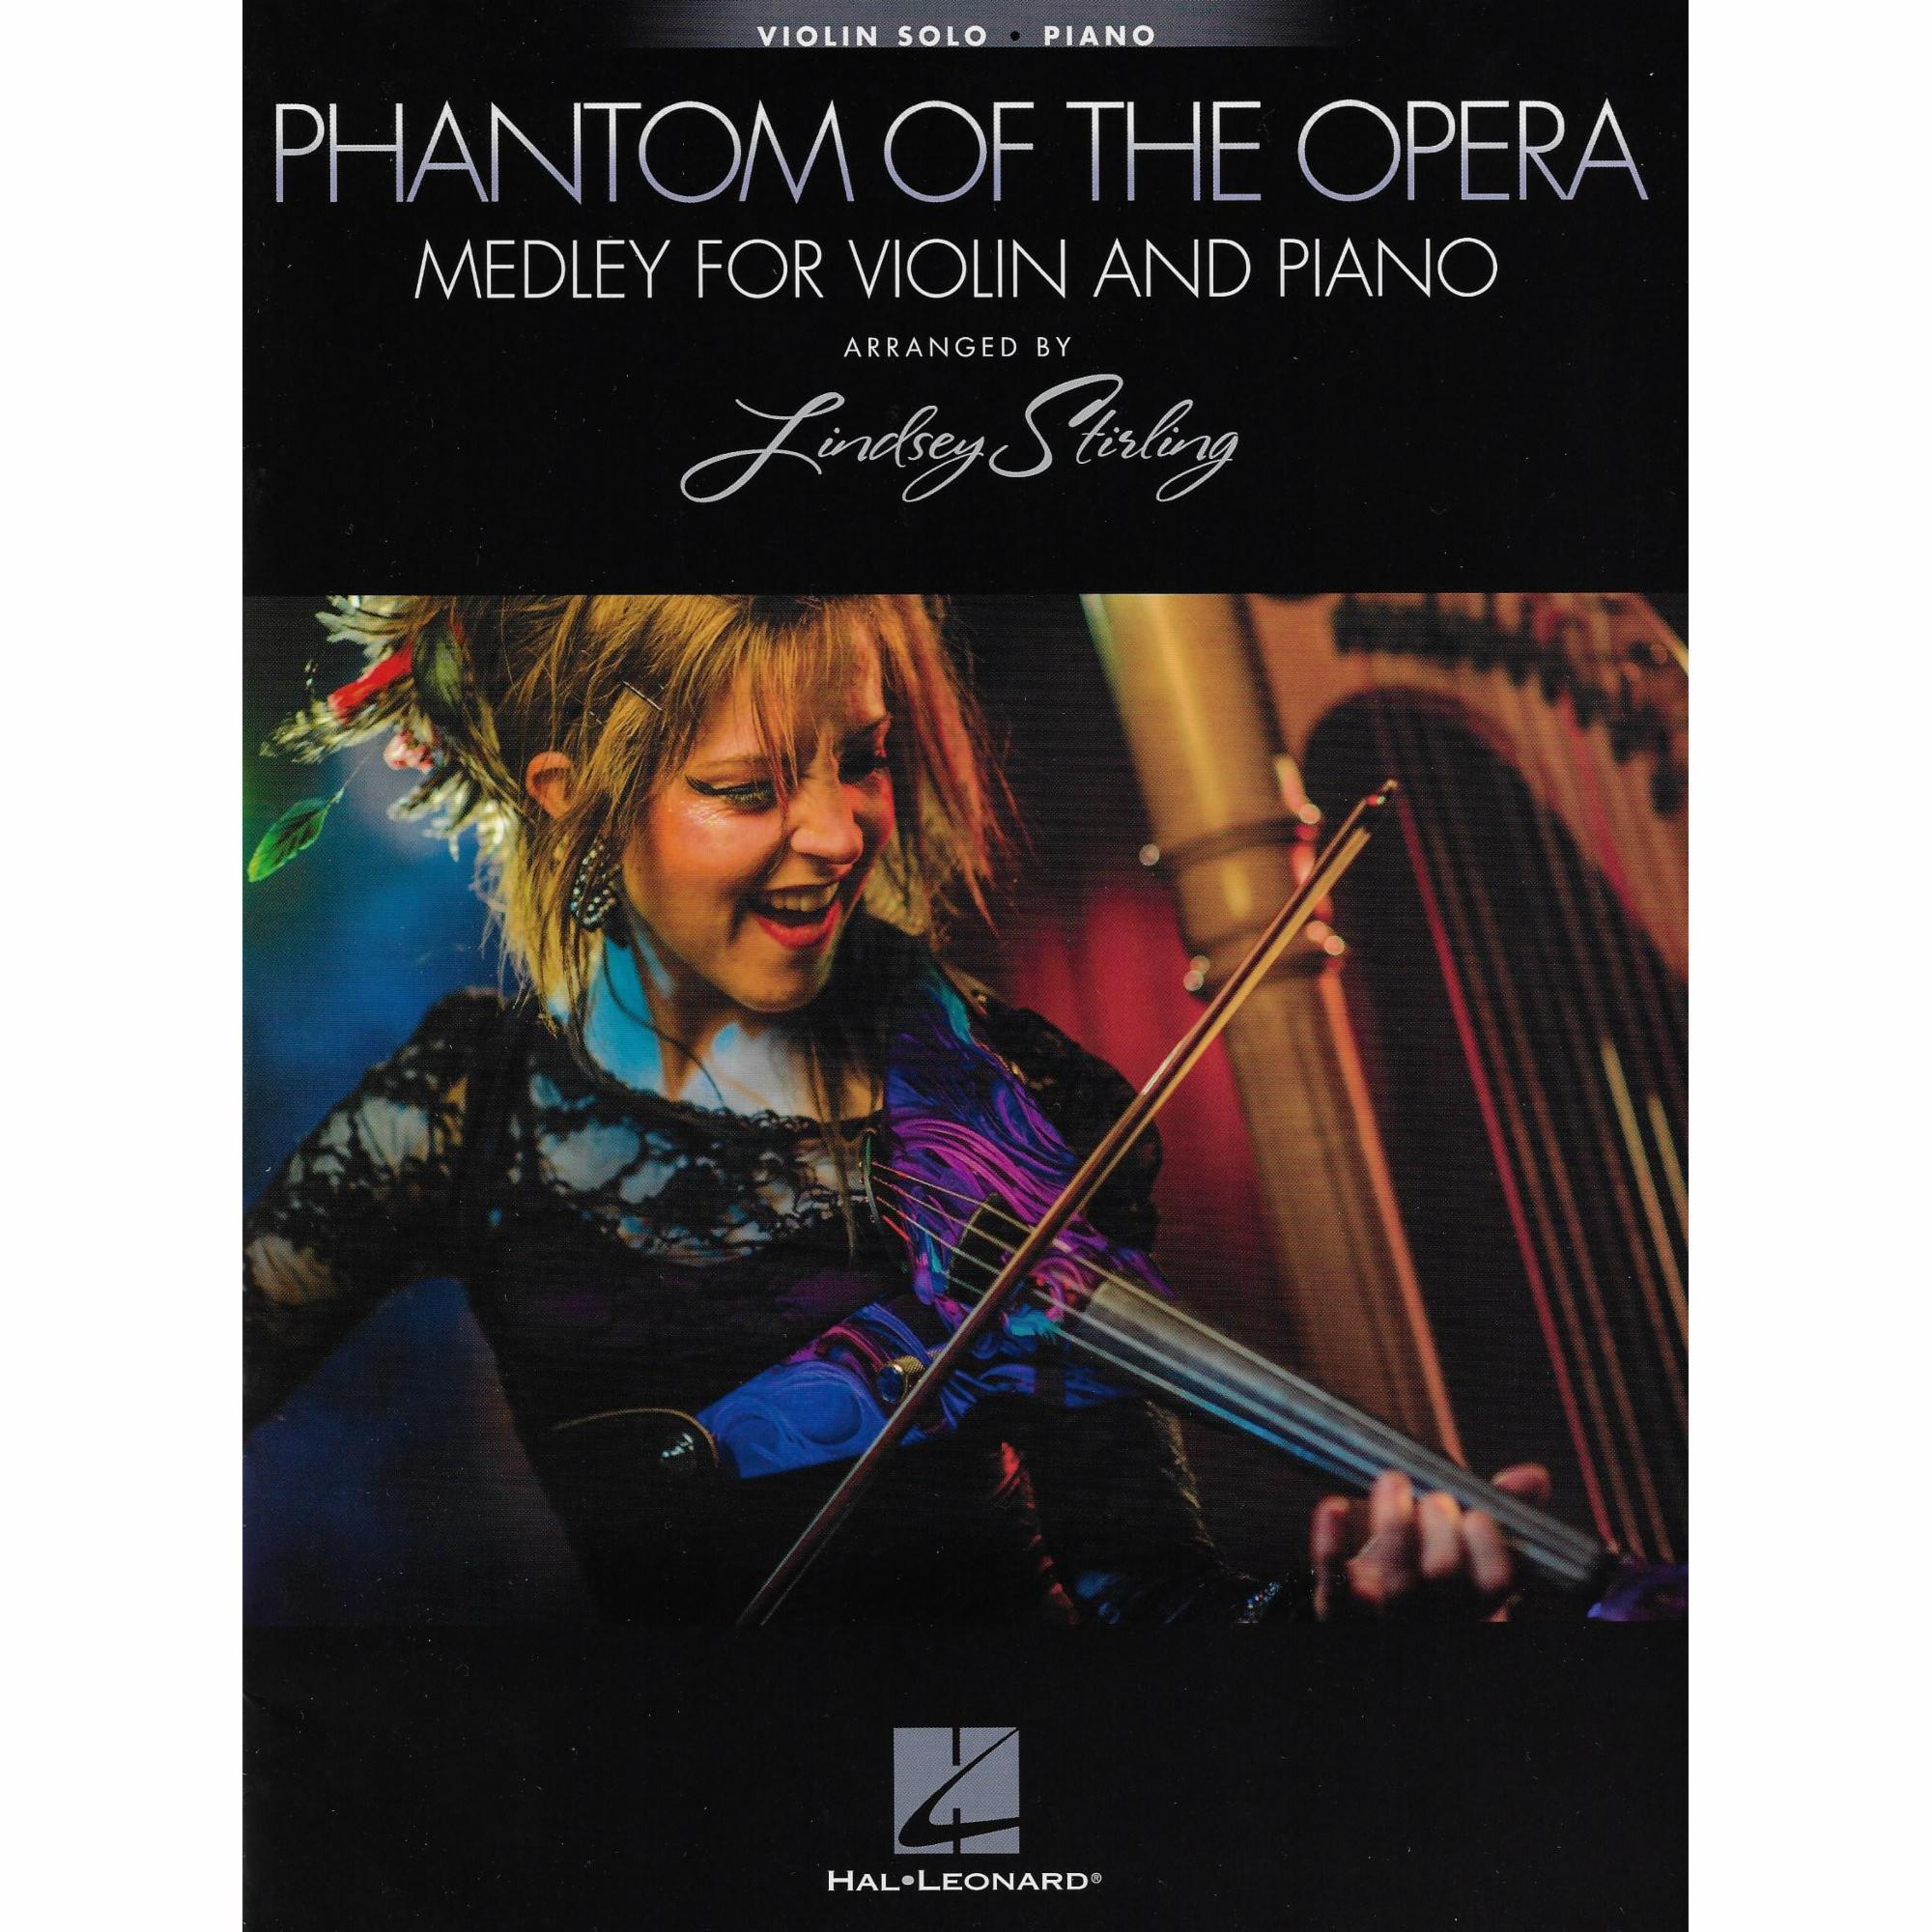 Phantom Of The Opera Medley For Violin And Piano